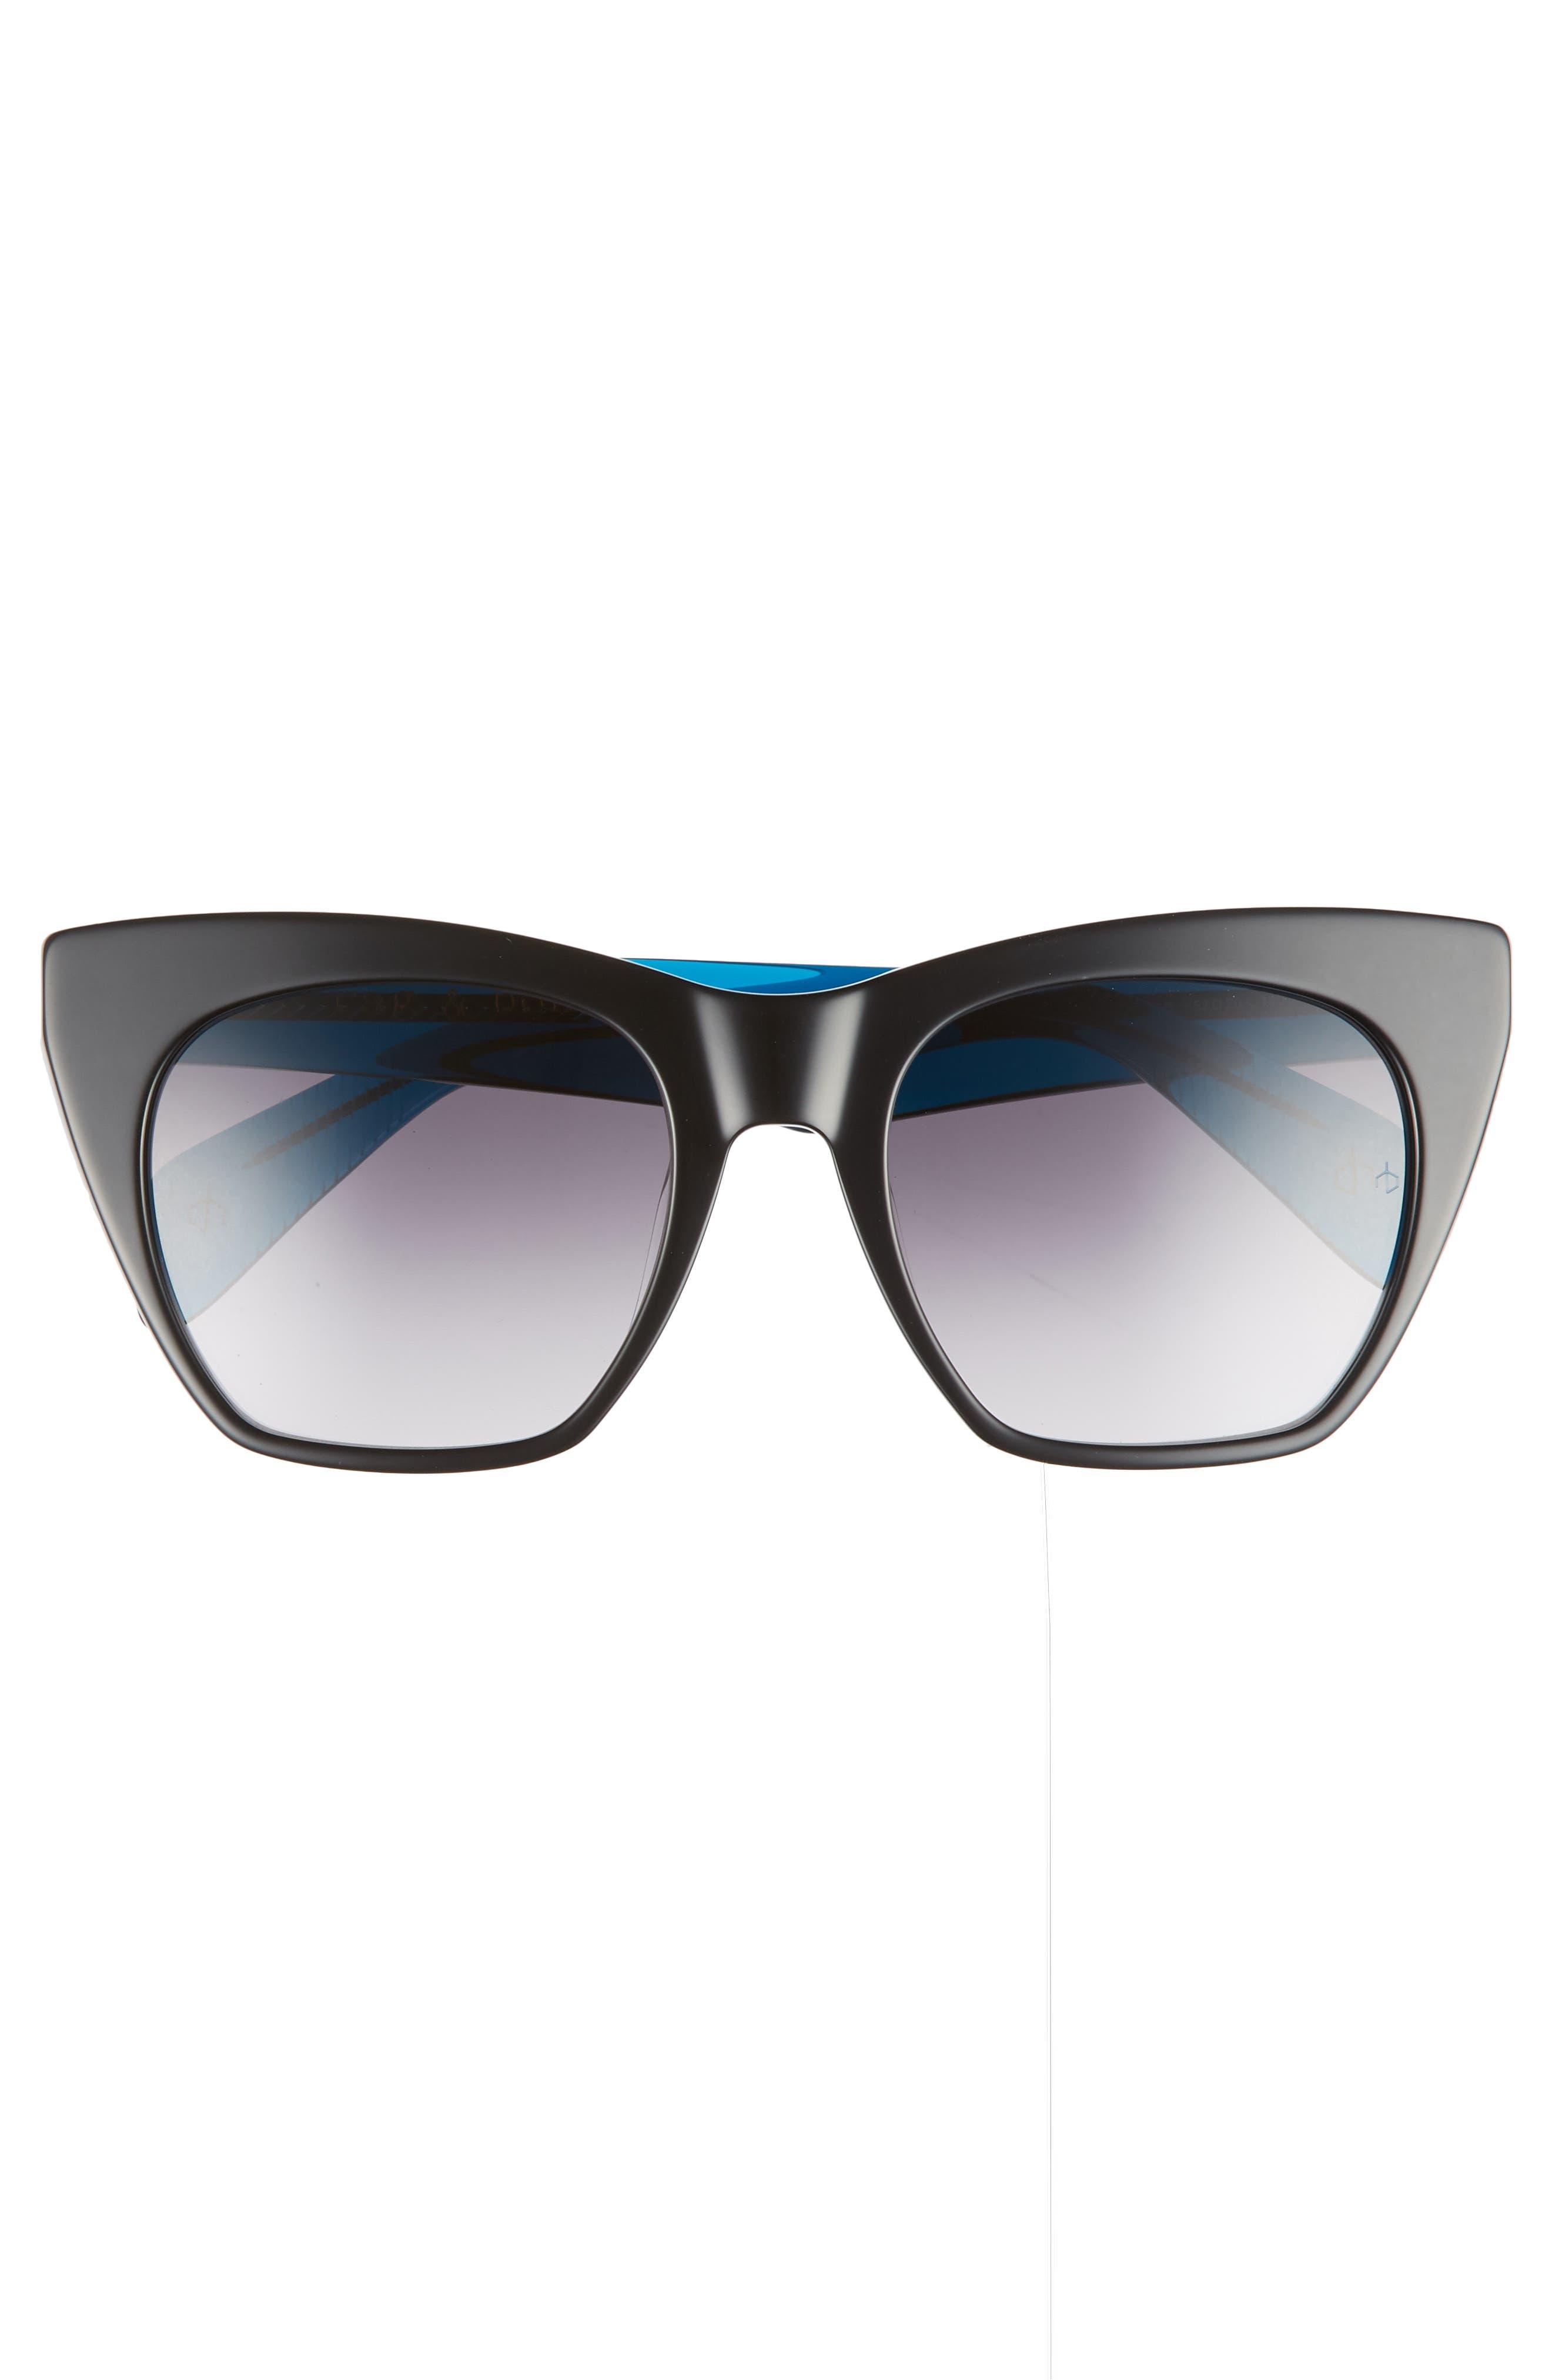 52mm Cat Eye Sunglasses,                             Alternate thumbnail 3, color,                             BLACK/ BLUE